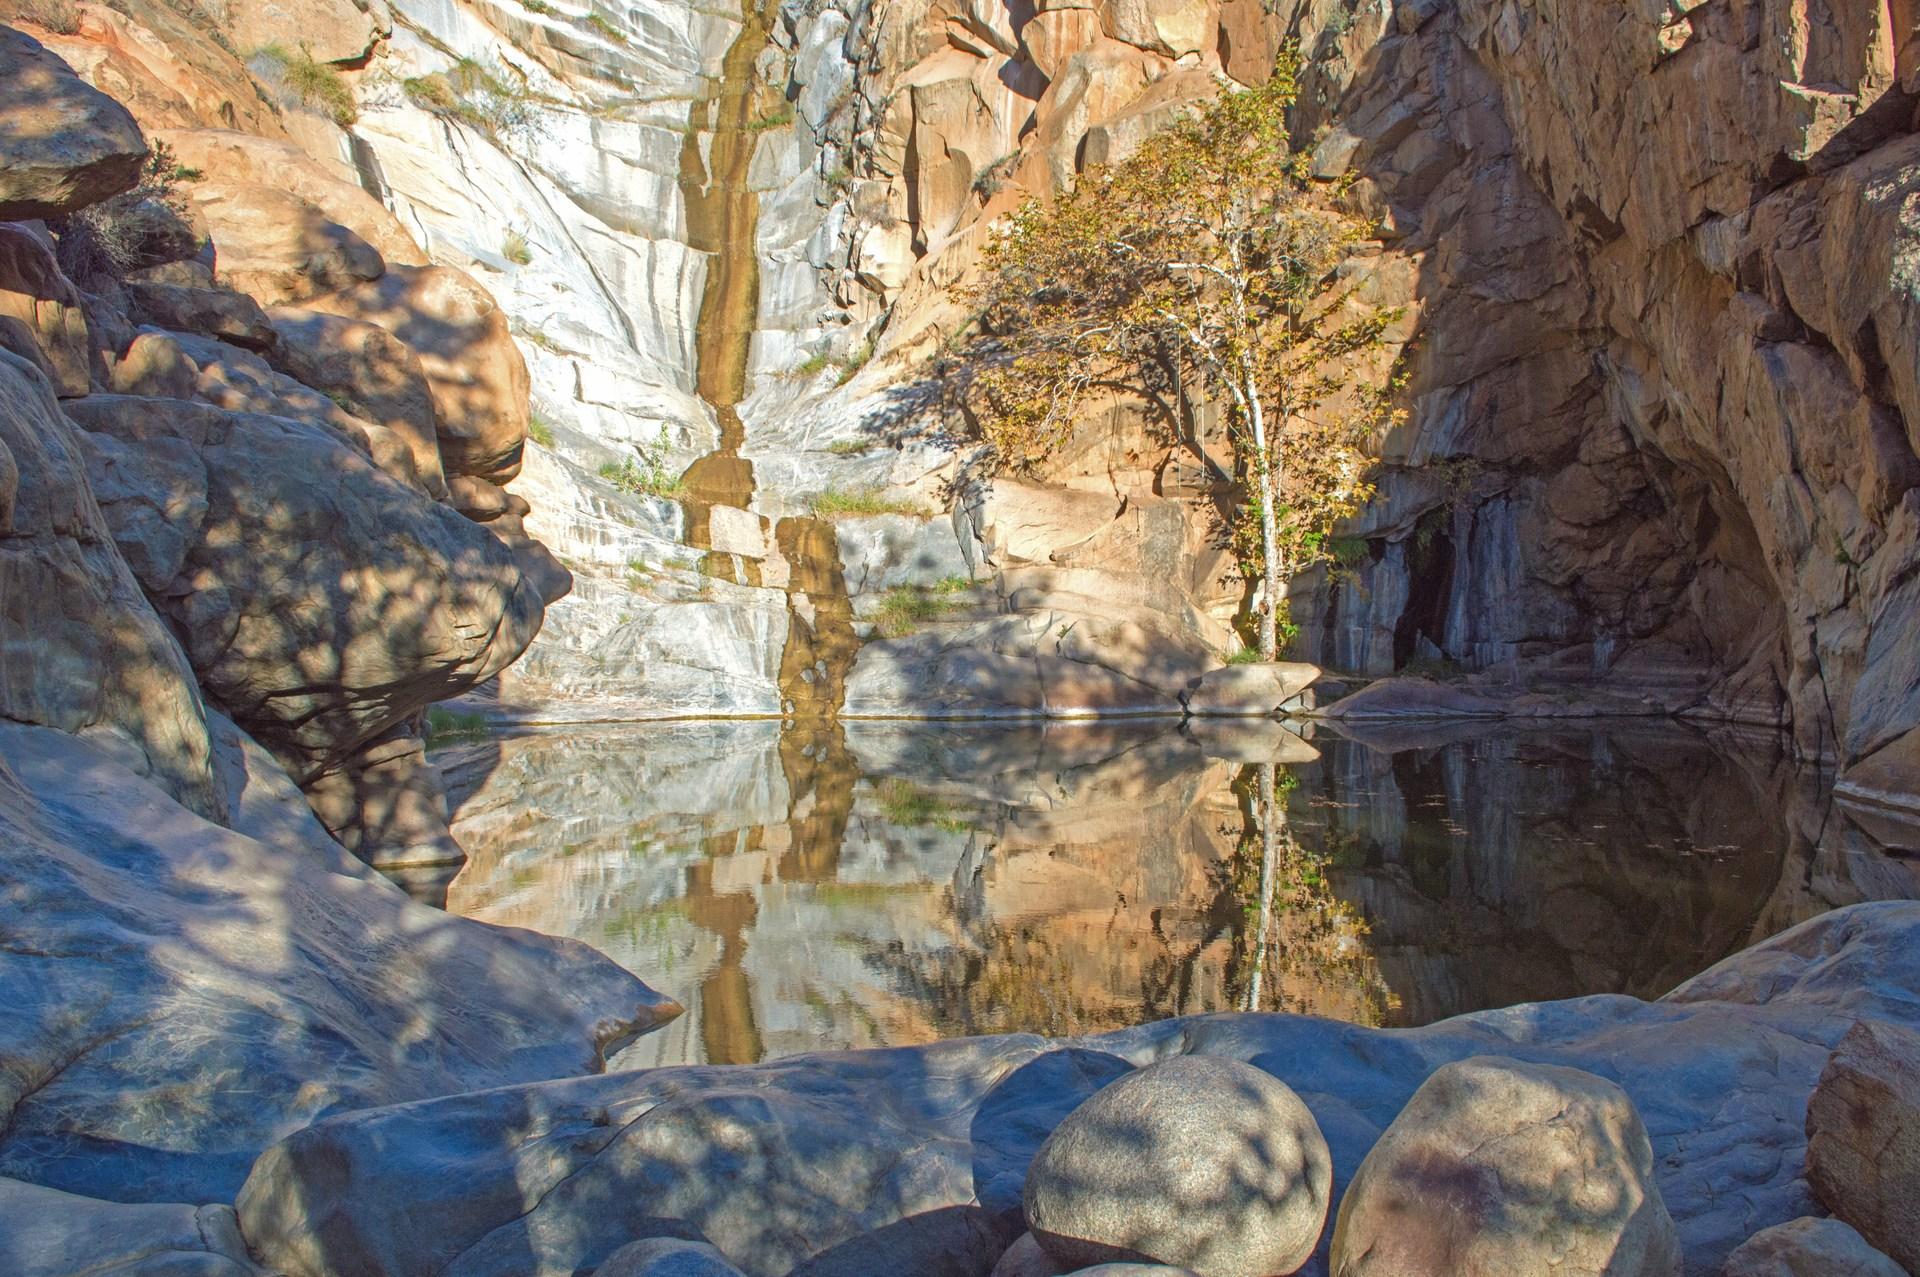 cedar creek falls + devils punchbowl hike via eagle peak road